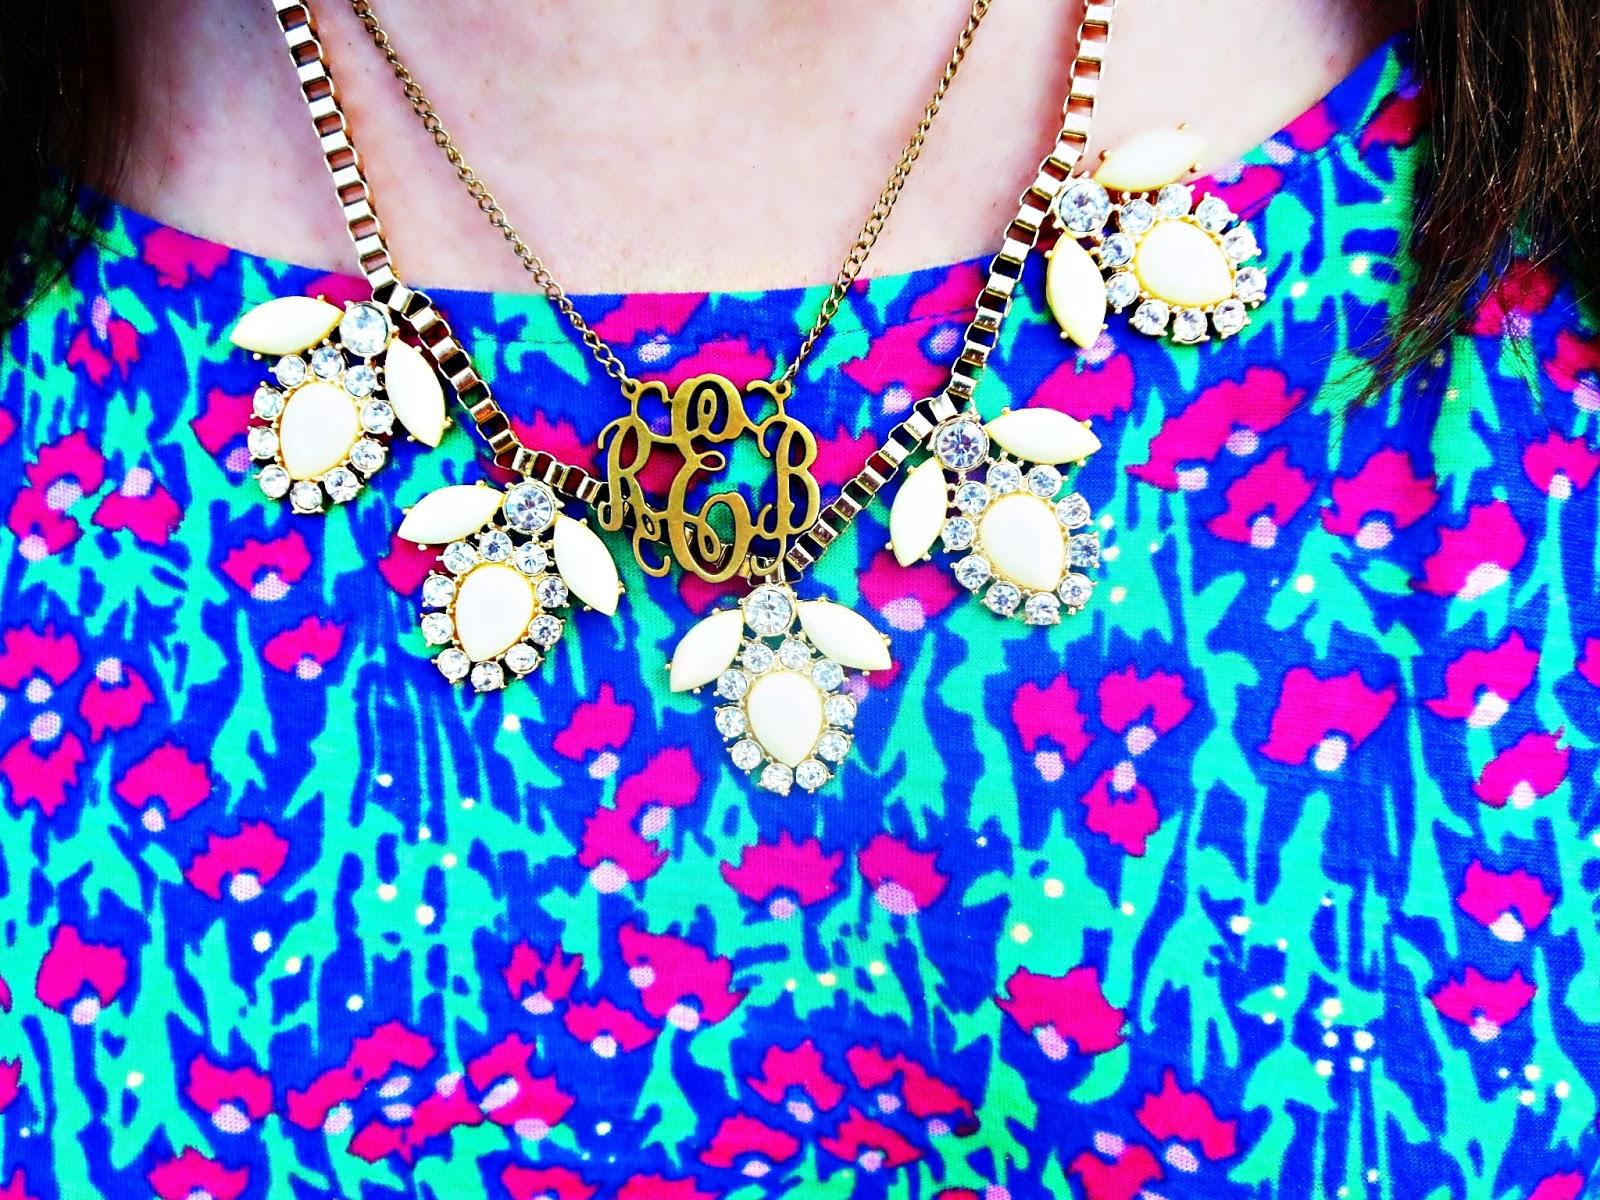 Yellow Statement Necklace: Old Navy, Monogram Necklace: Mypersonalized  Etsy Shop, Blue Bee Bracelet: Target, Charm Bracelet: Pandora,